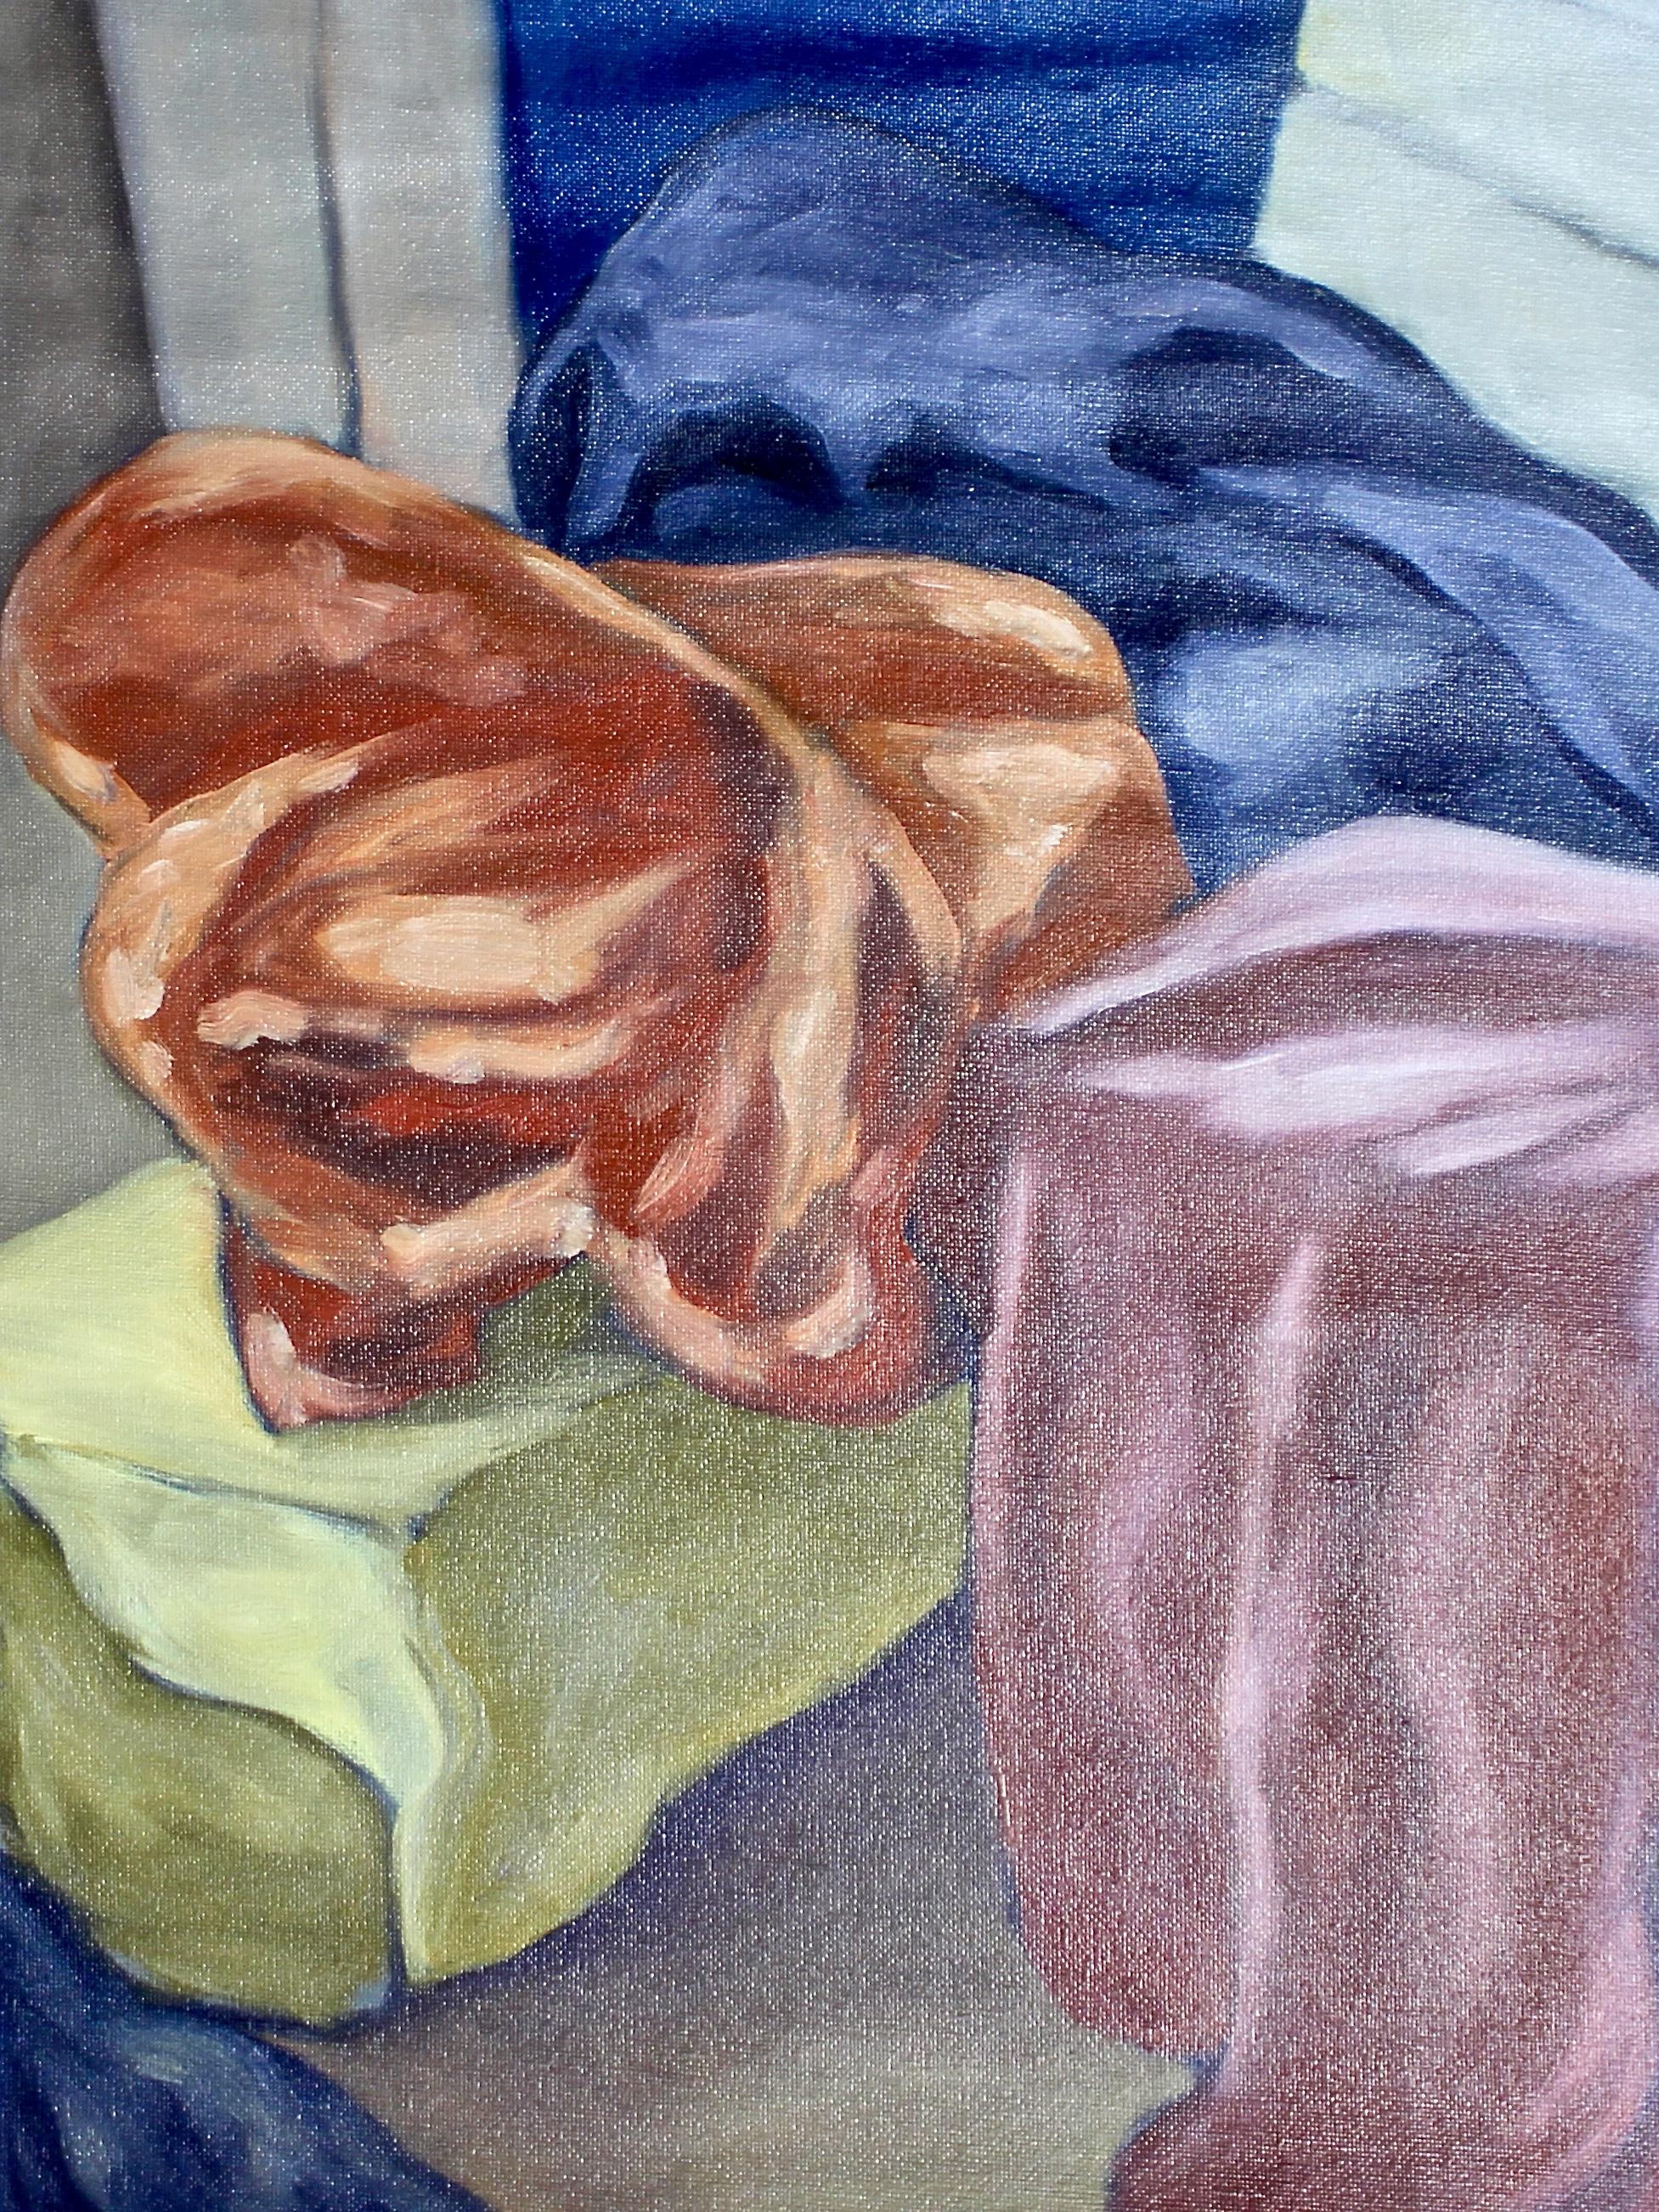 Fabric Study -  2006 oil on canvas 38cm x 51cm